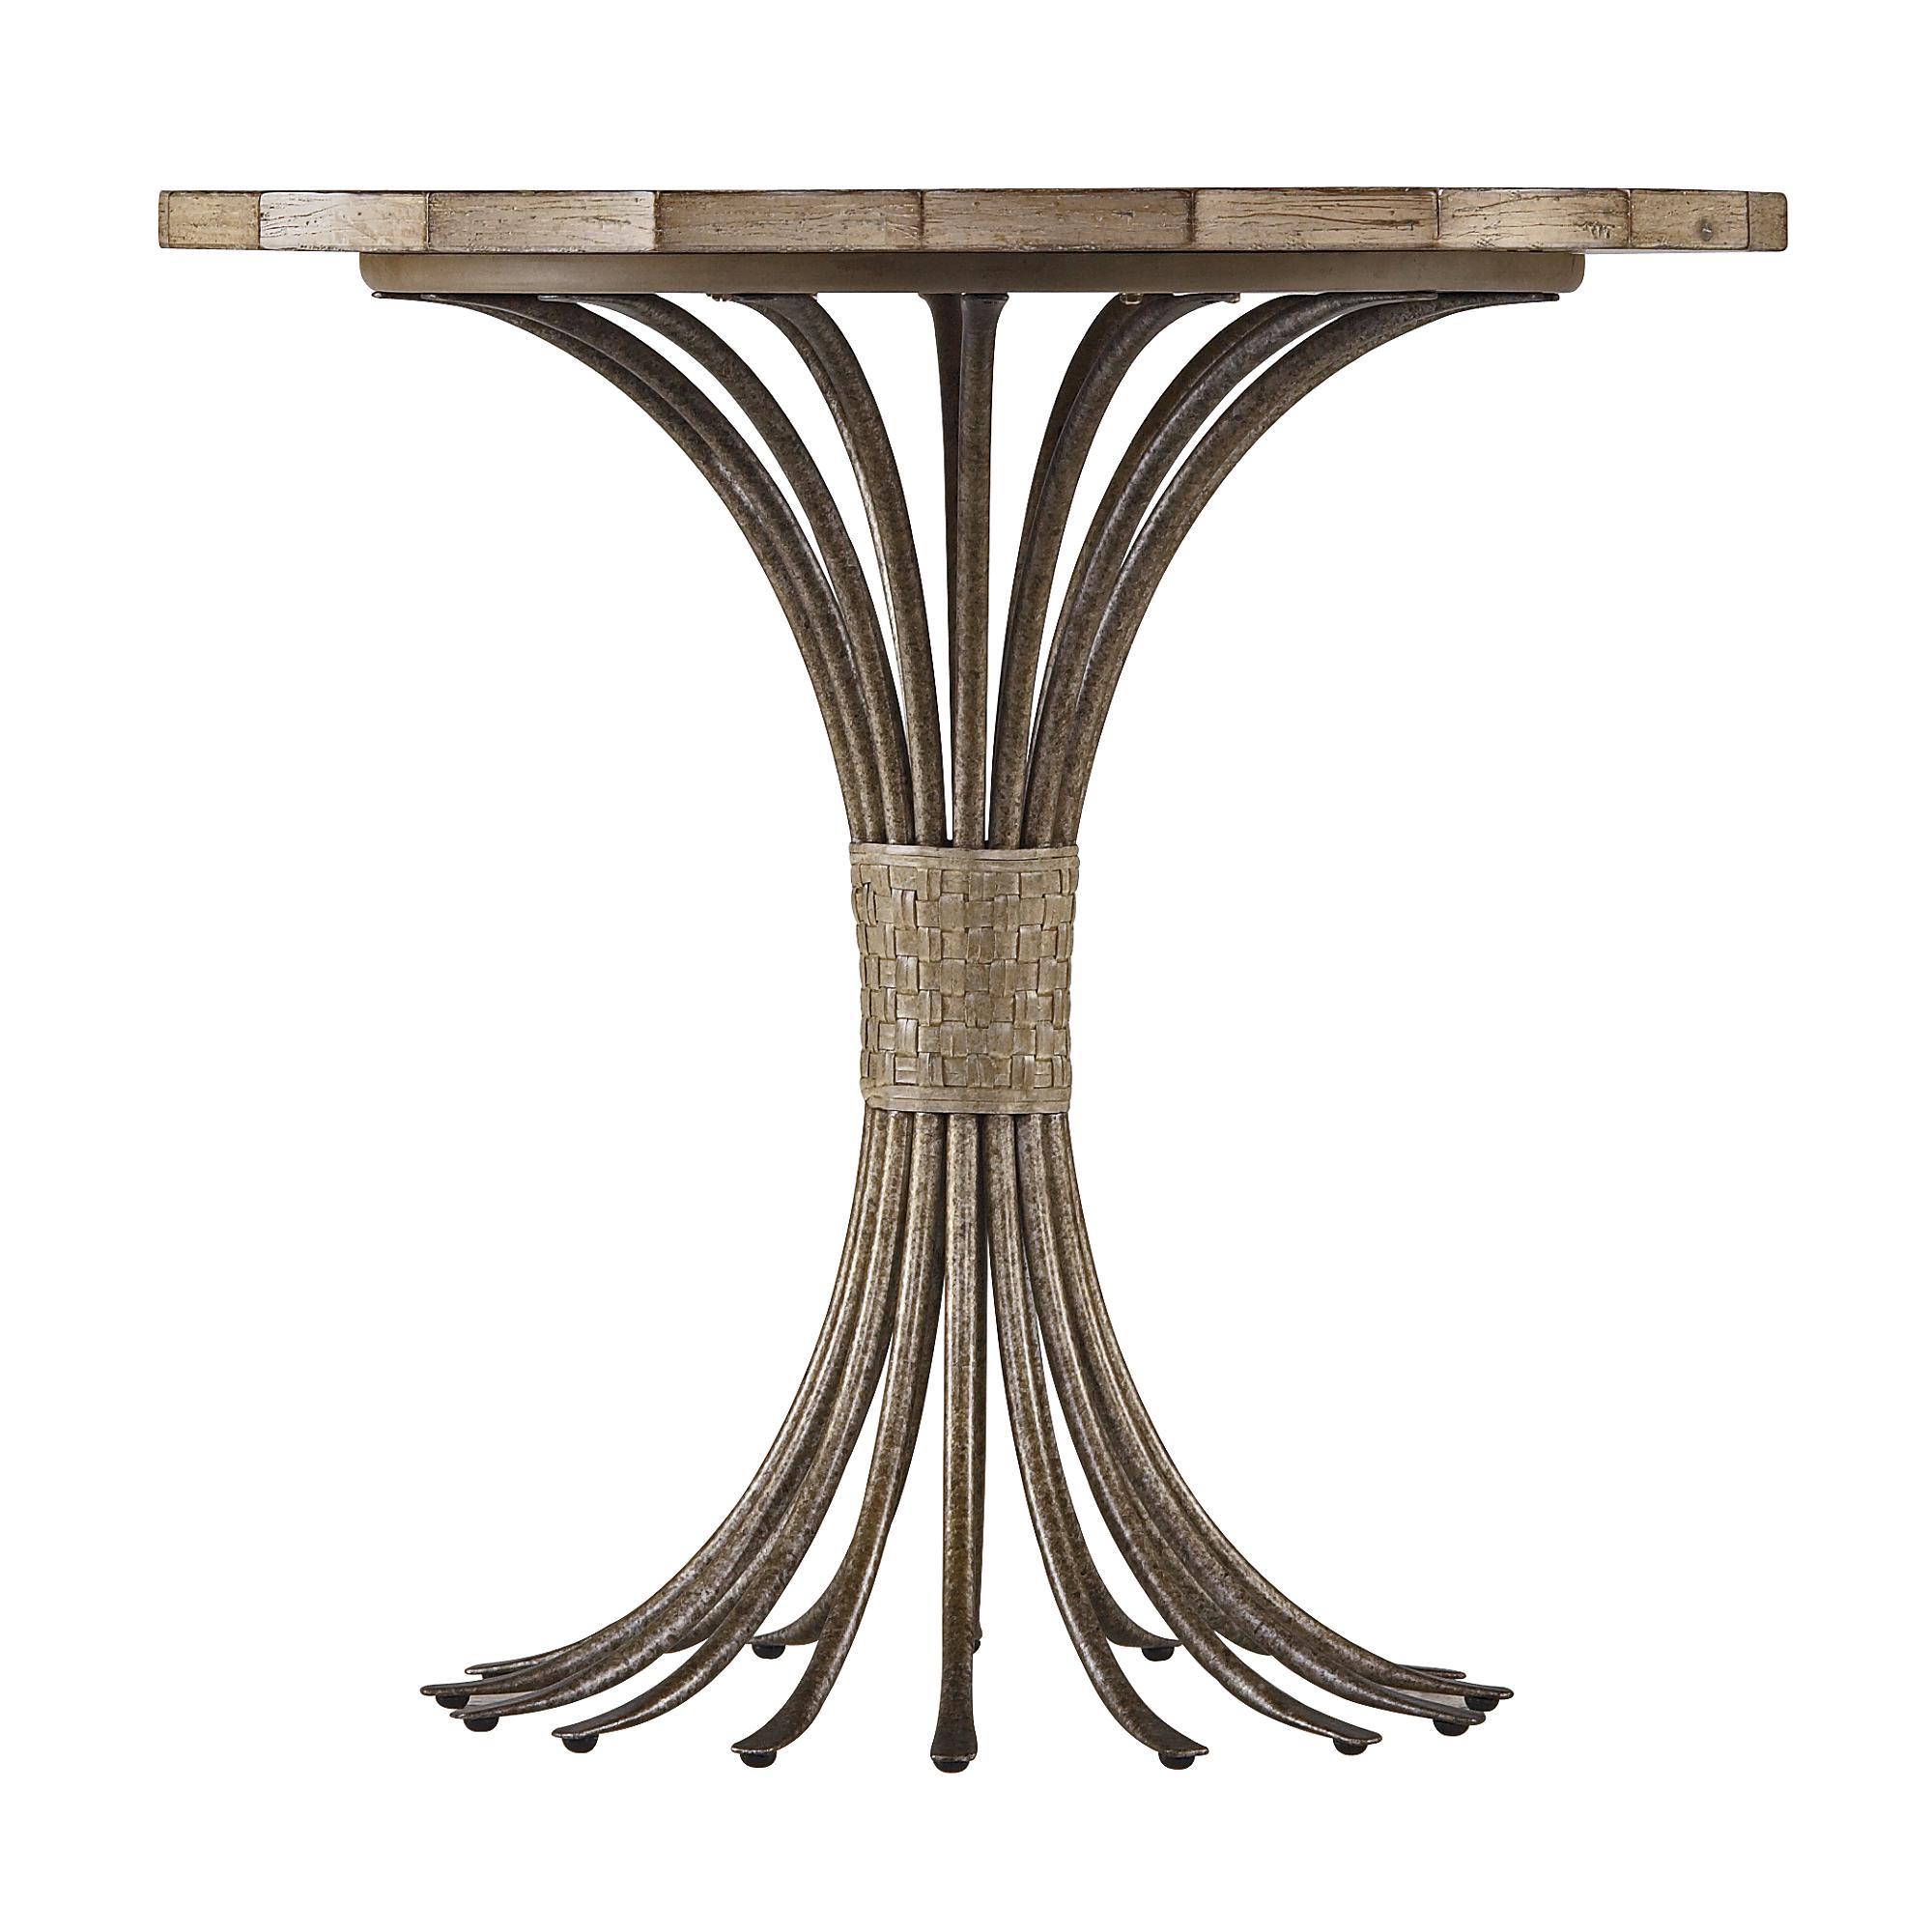 Stanley Furniture Coastal Living Resort Eddy's Landing Lamp Table - Item Number: 062-75-08